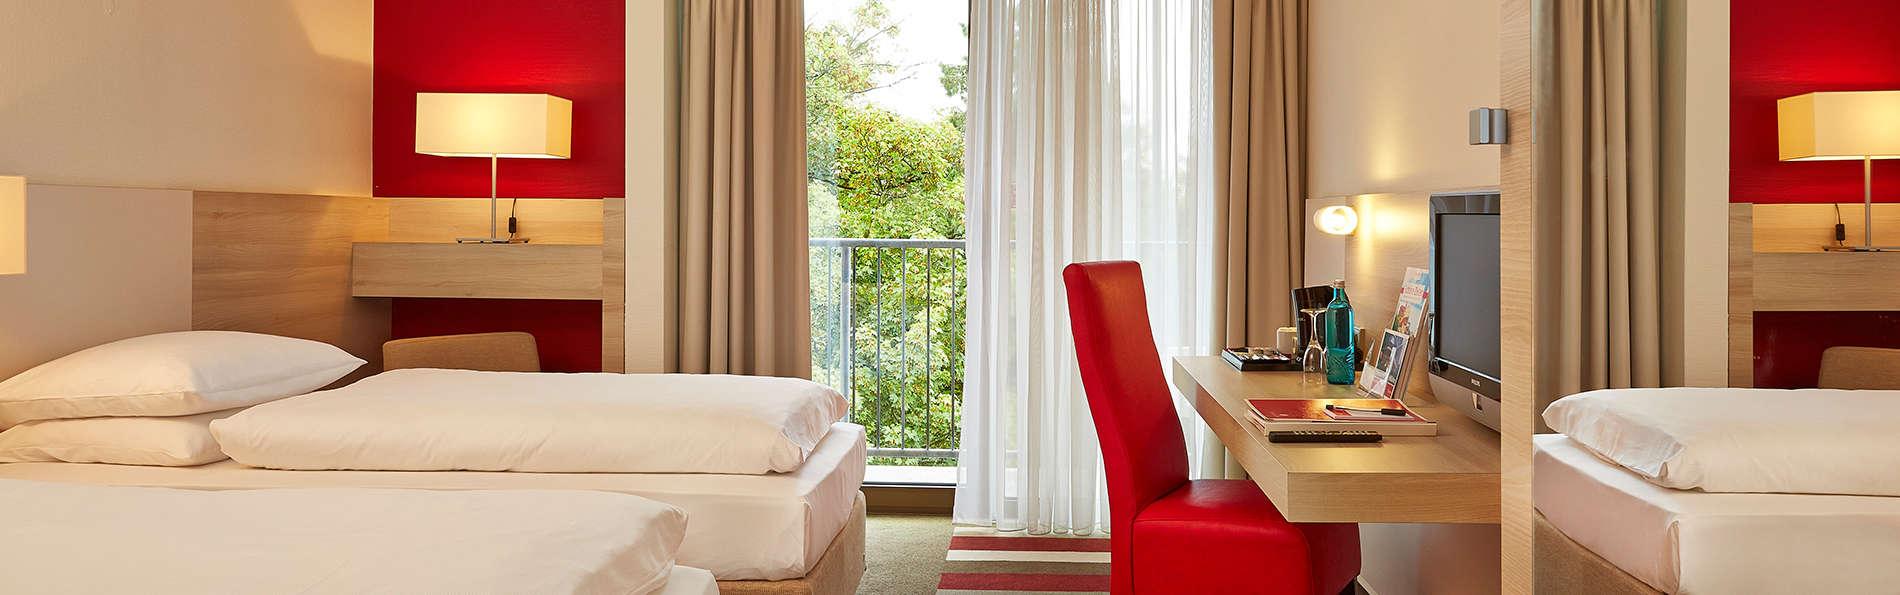 H+ Hotel Bad Soden - EDIT_comfort_room4.jpg